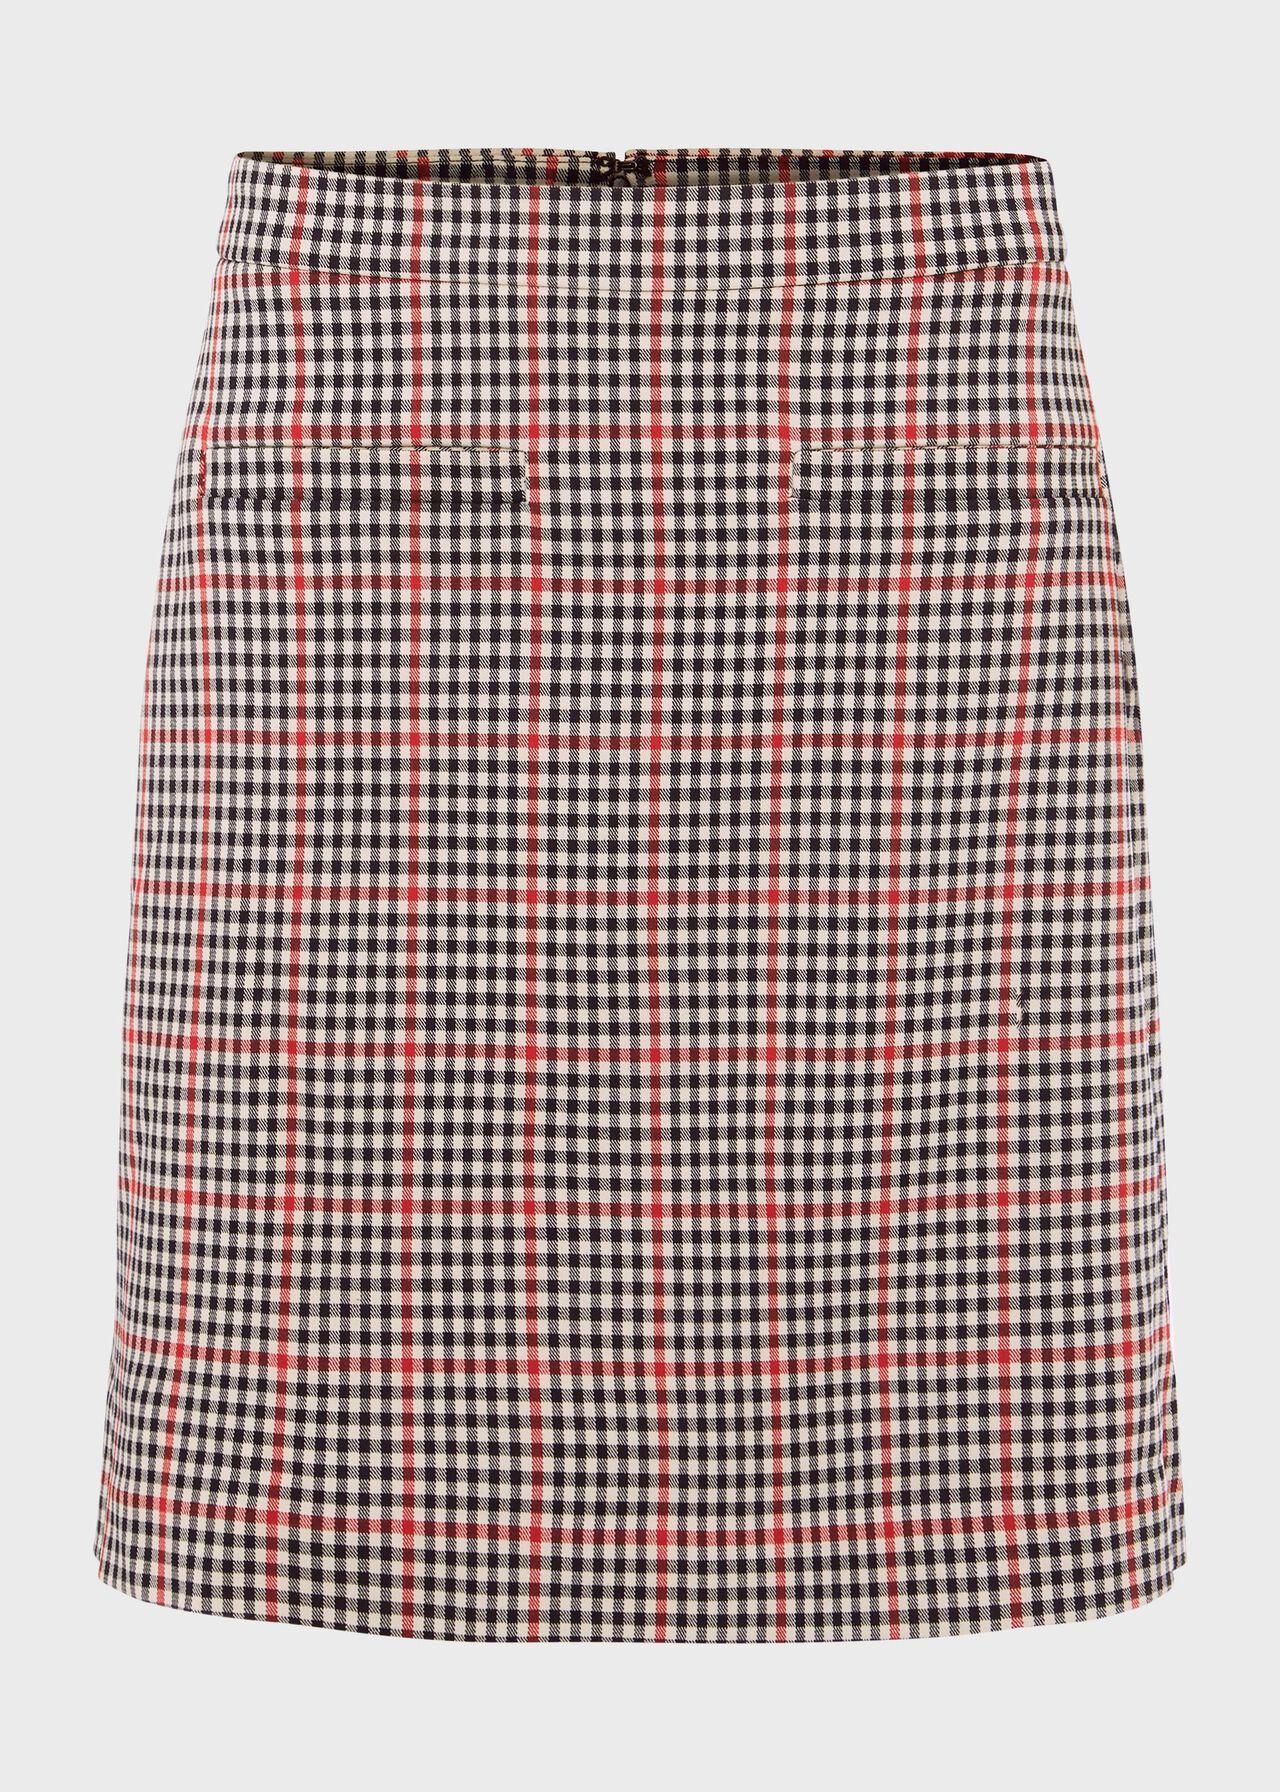 Vanetta Check A Line Skirt Red Black